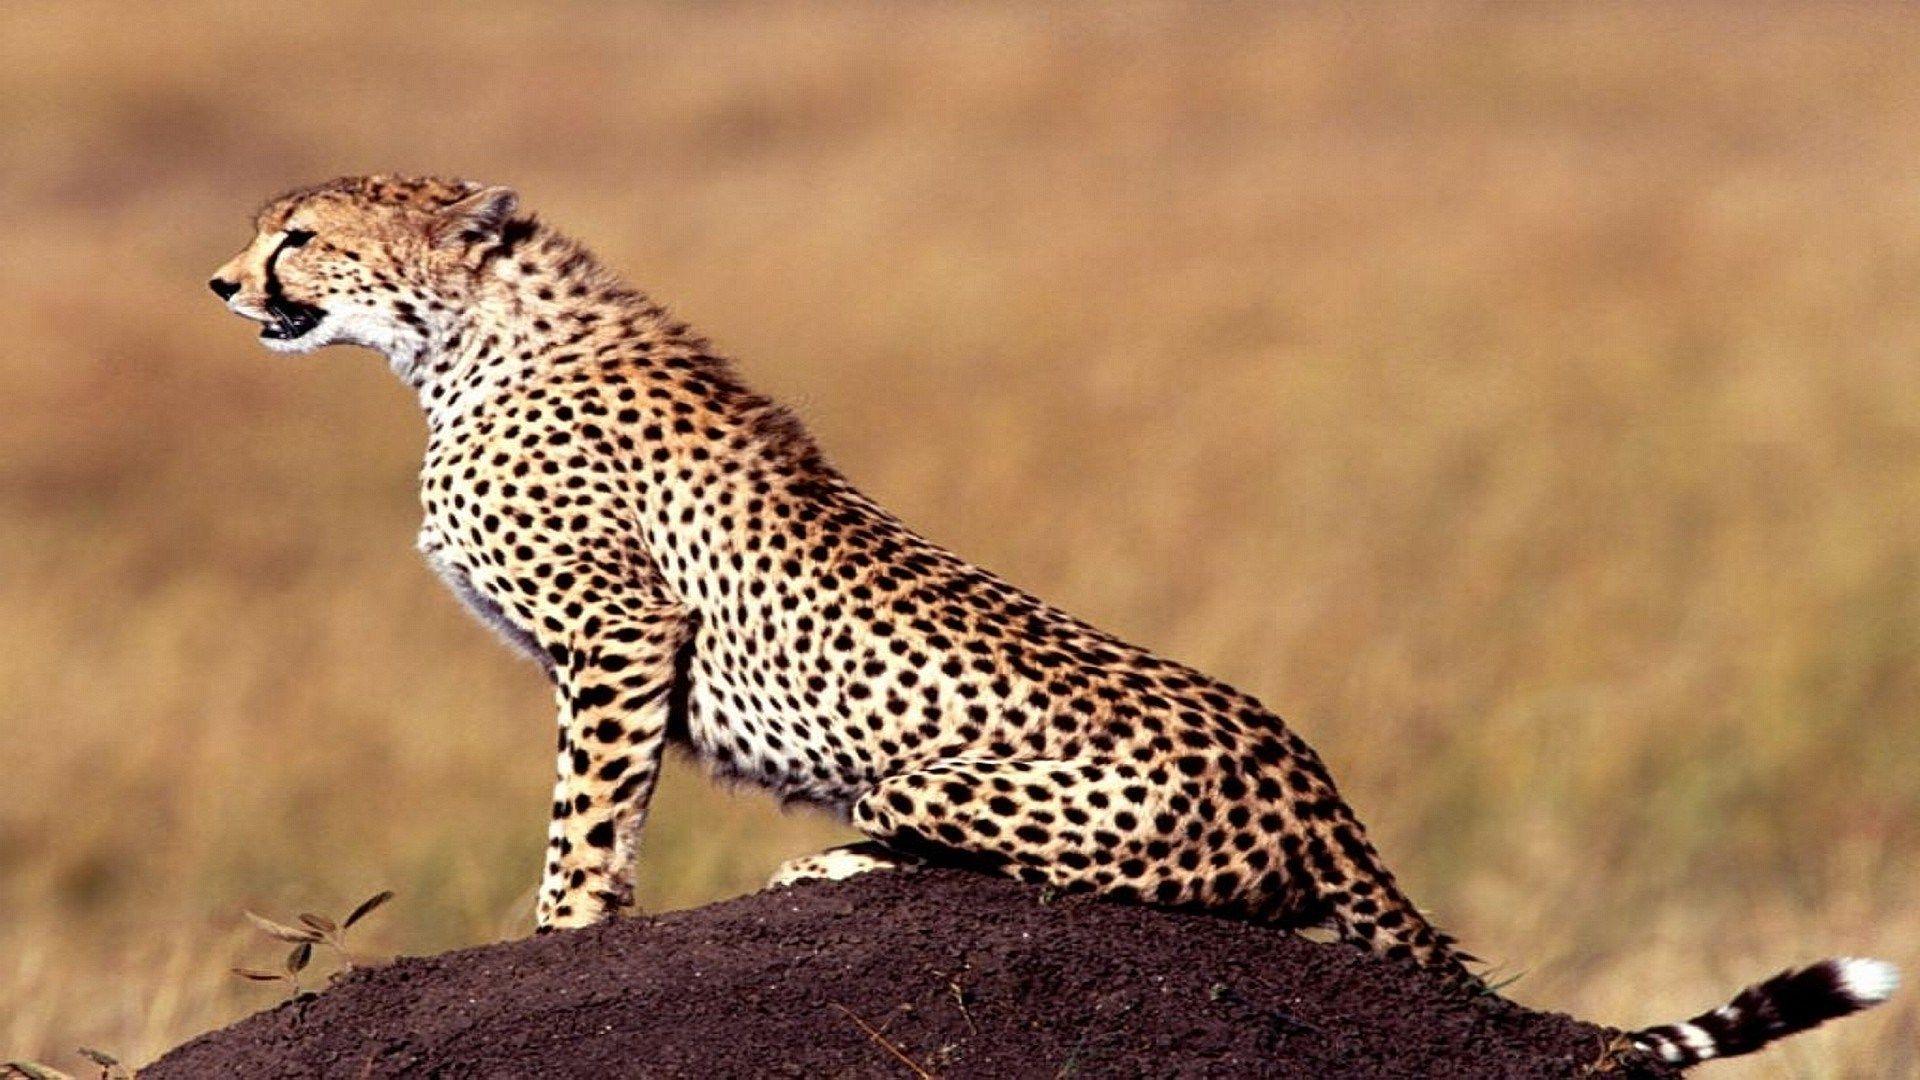 Cheetah Wallpaper Photos Free Cheetah Wallpaper Animals Cheetah